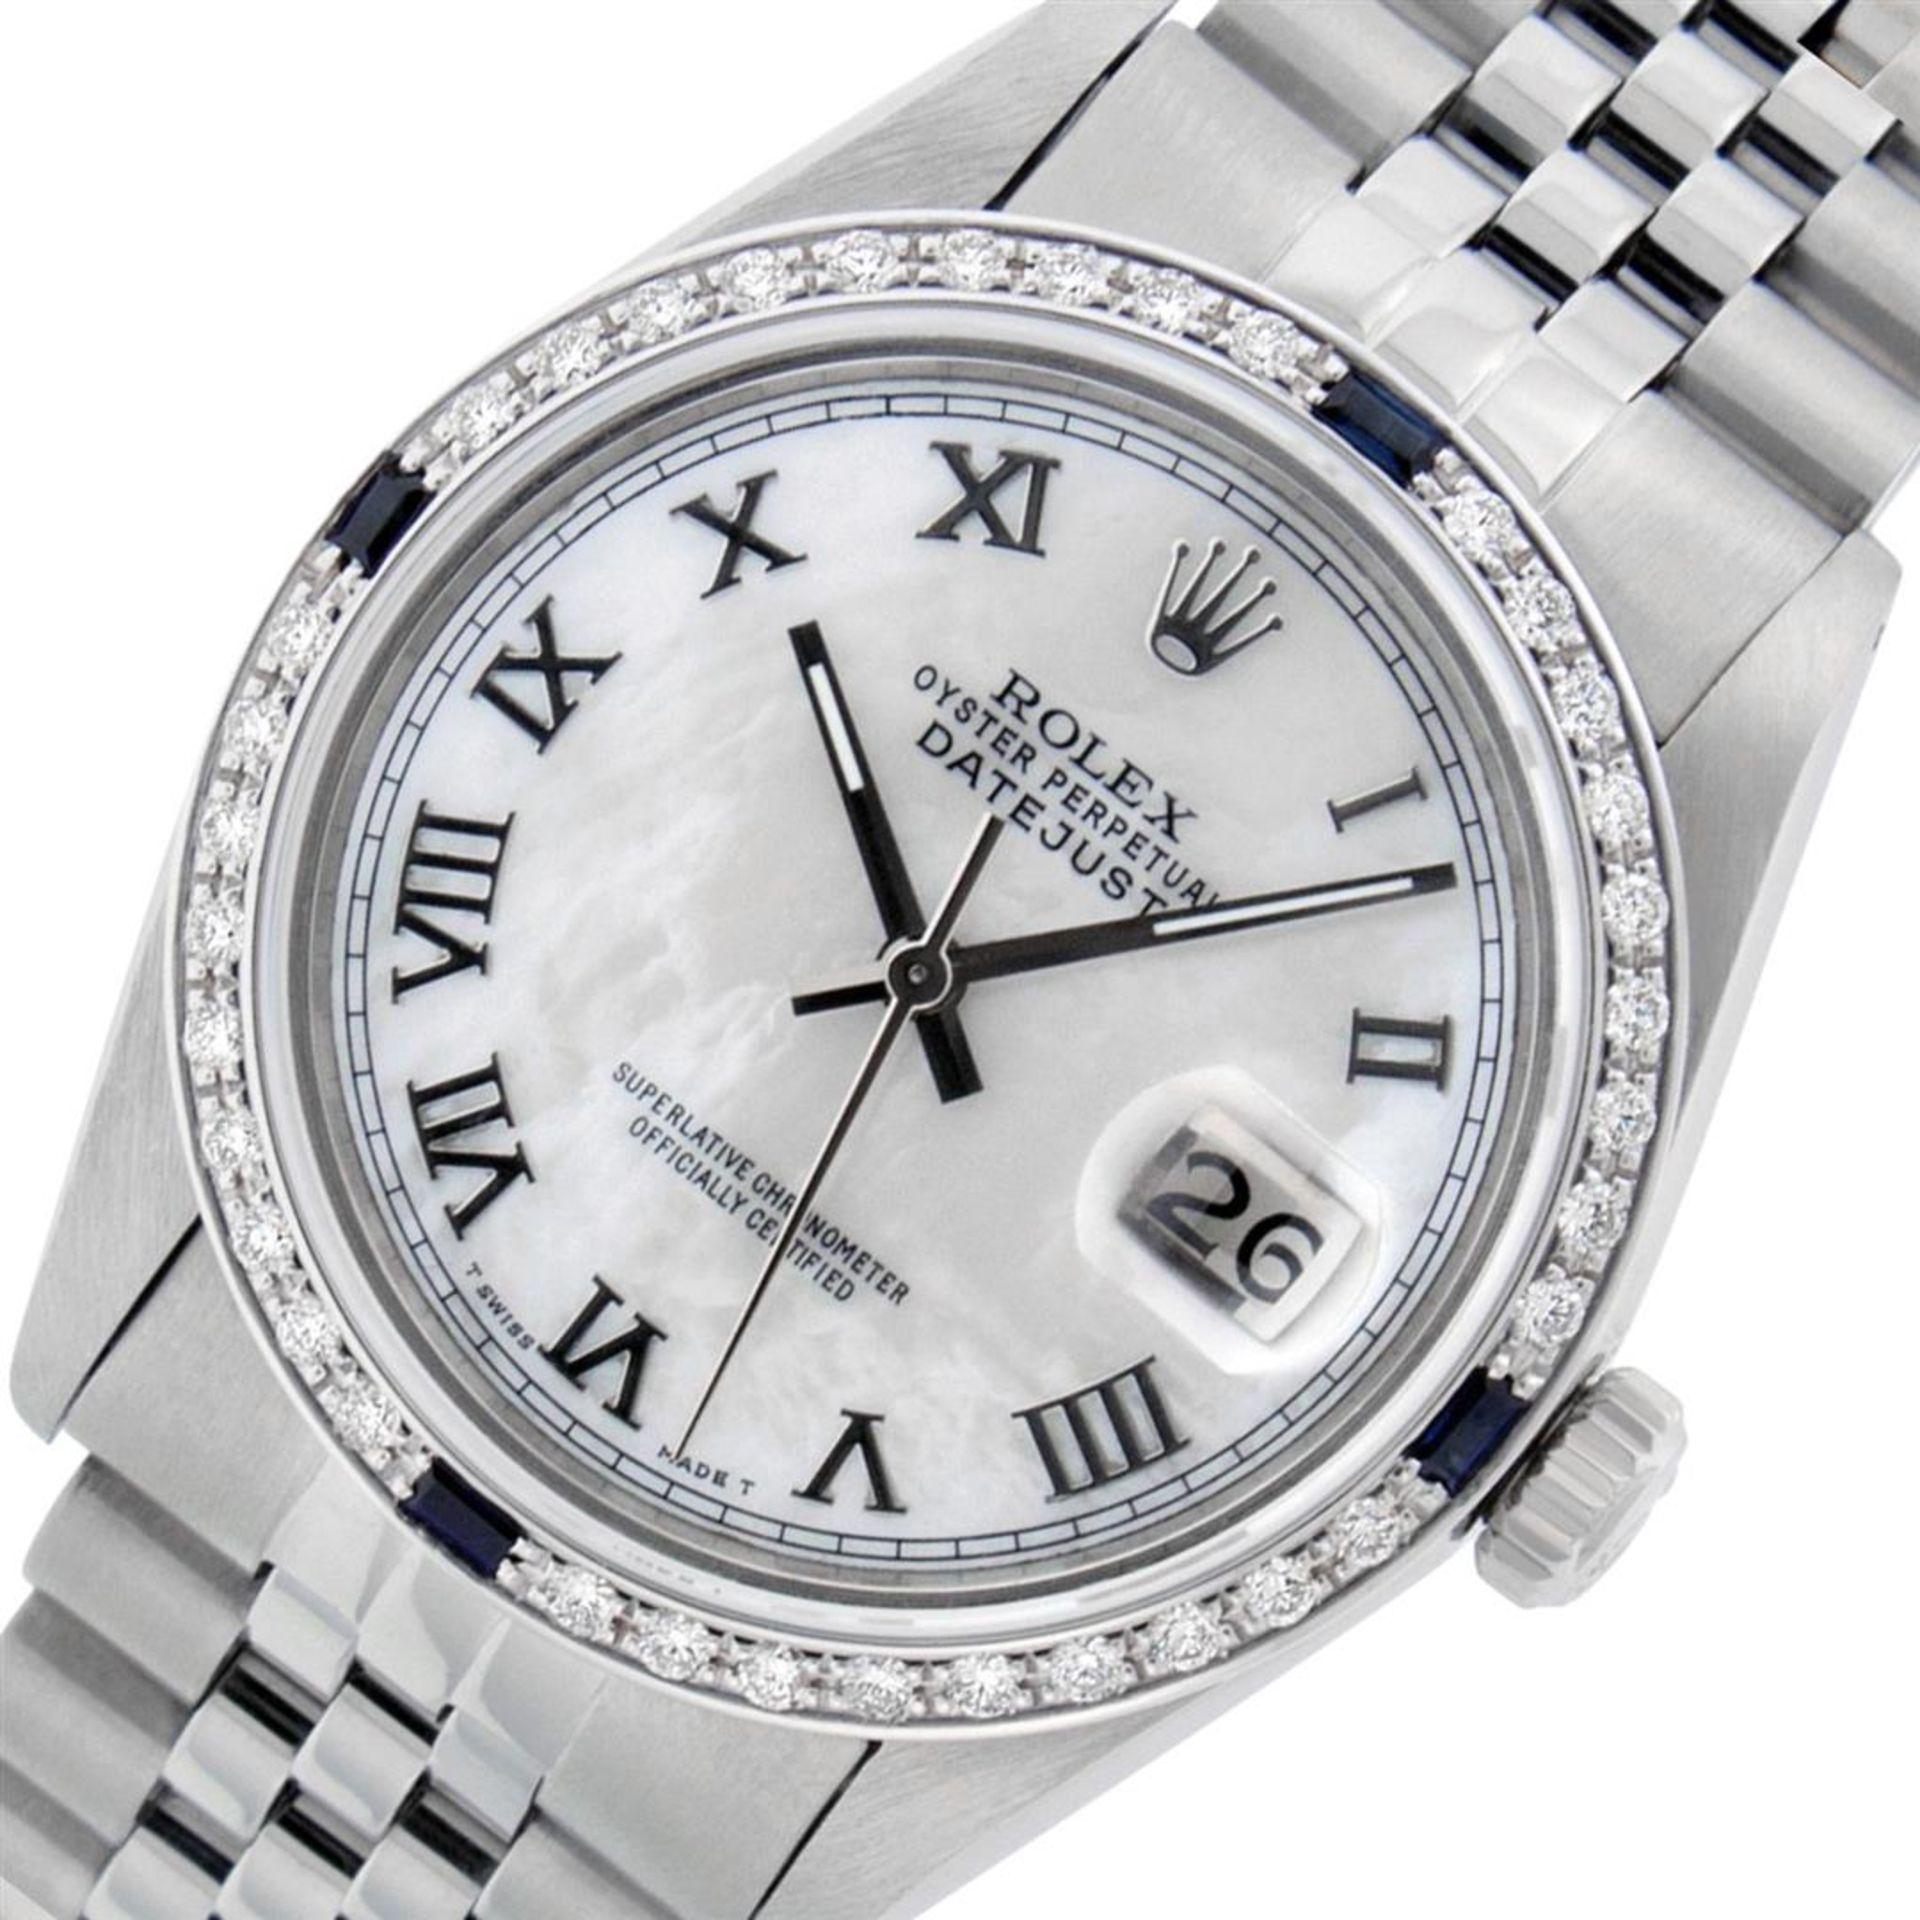 Rolex Mens Stainless Steel MOP Roman 36MM Diamond & Sapphire Datejust Wristwatch - Image 3 of 9